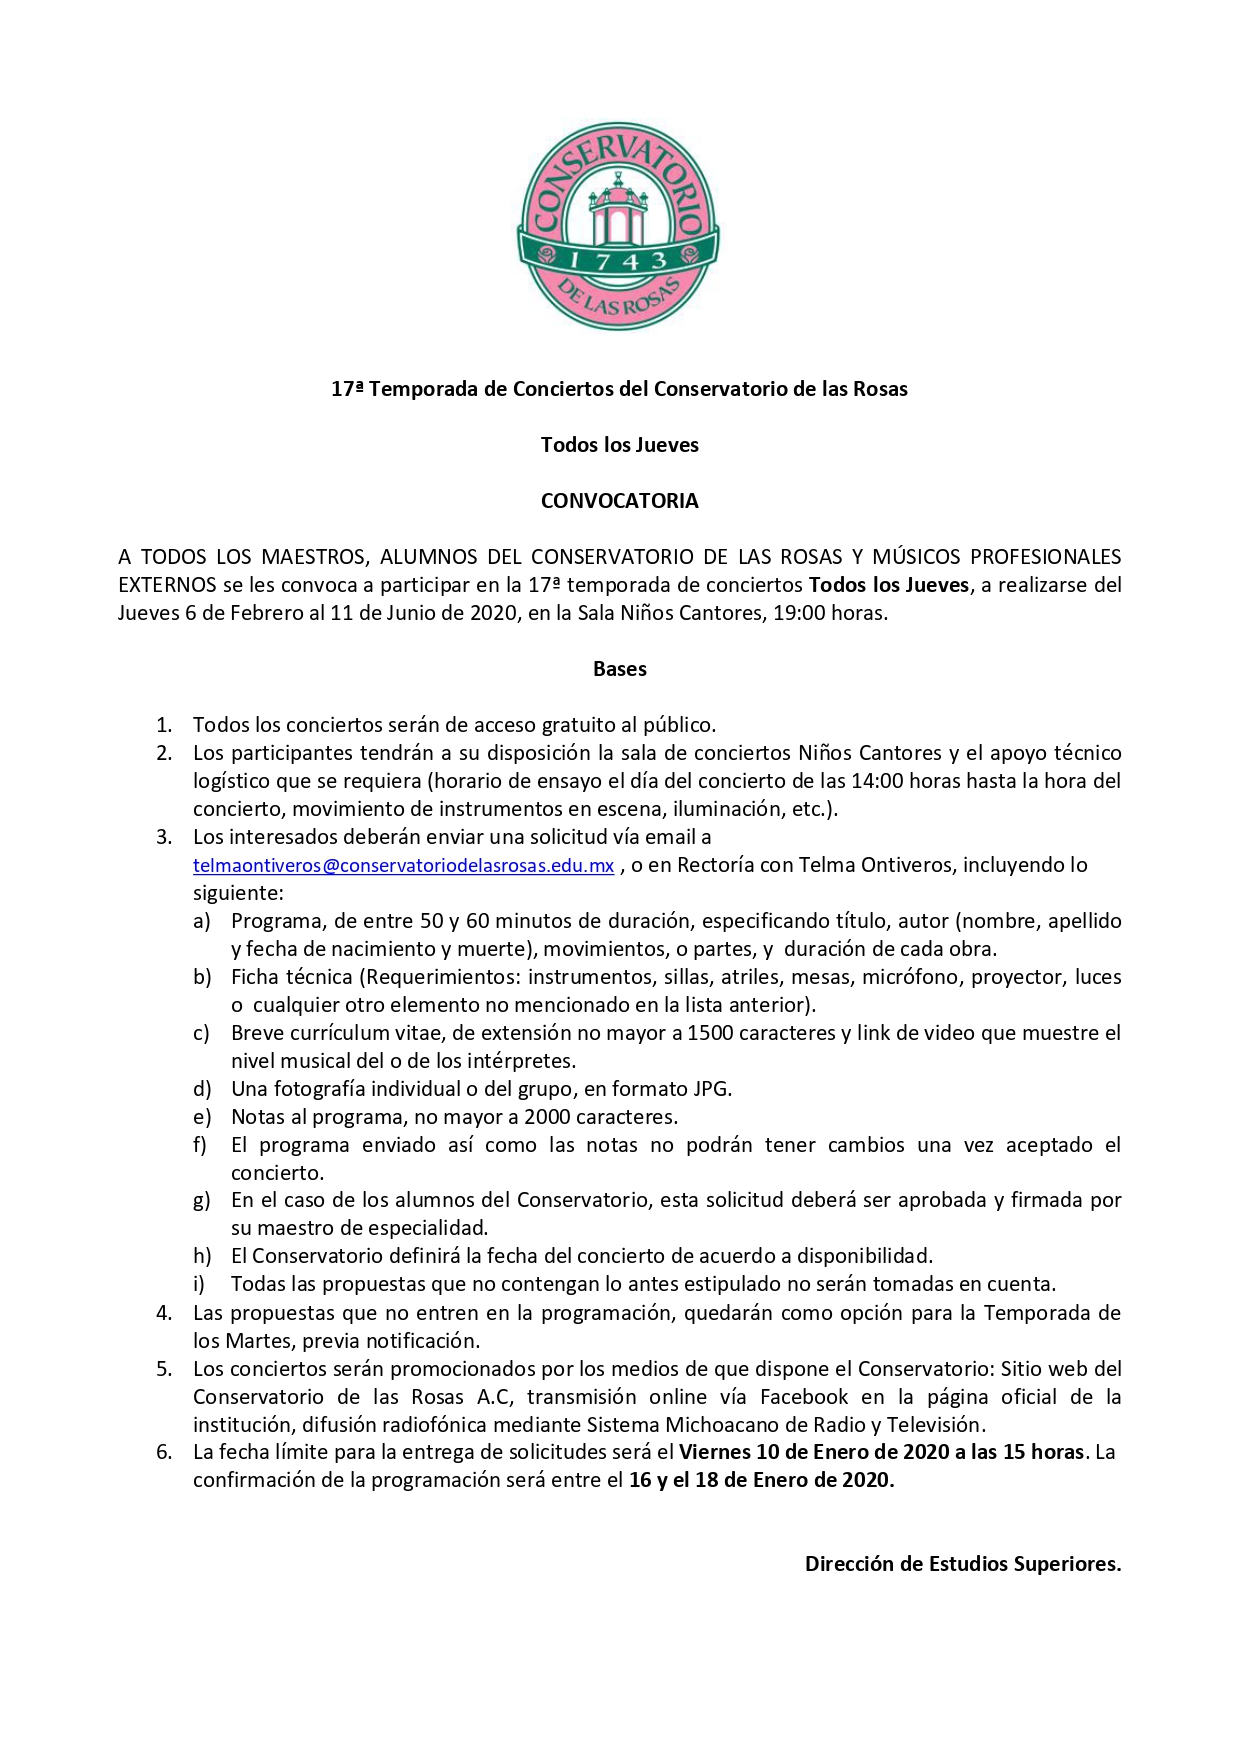 Convocatoria 17ª Temporada de Conciertos, Nov 24_pages-to-jpg-0001